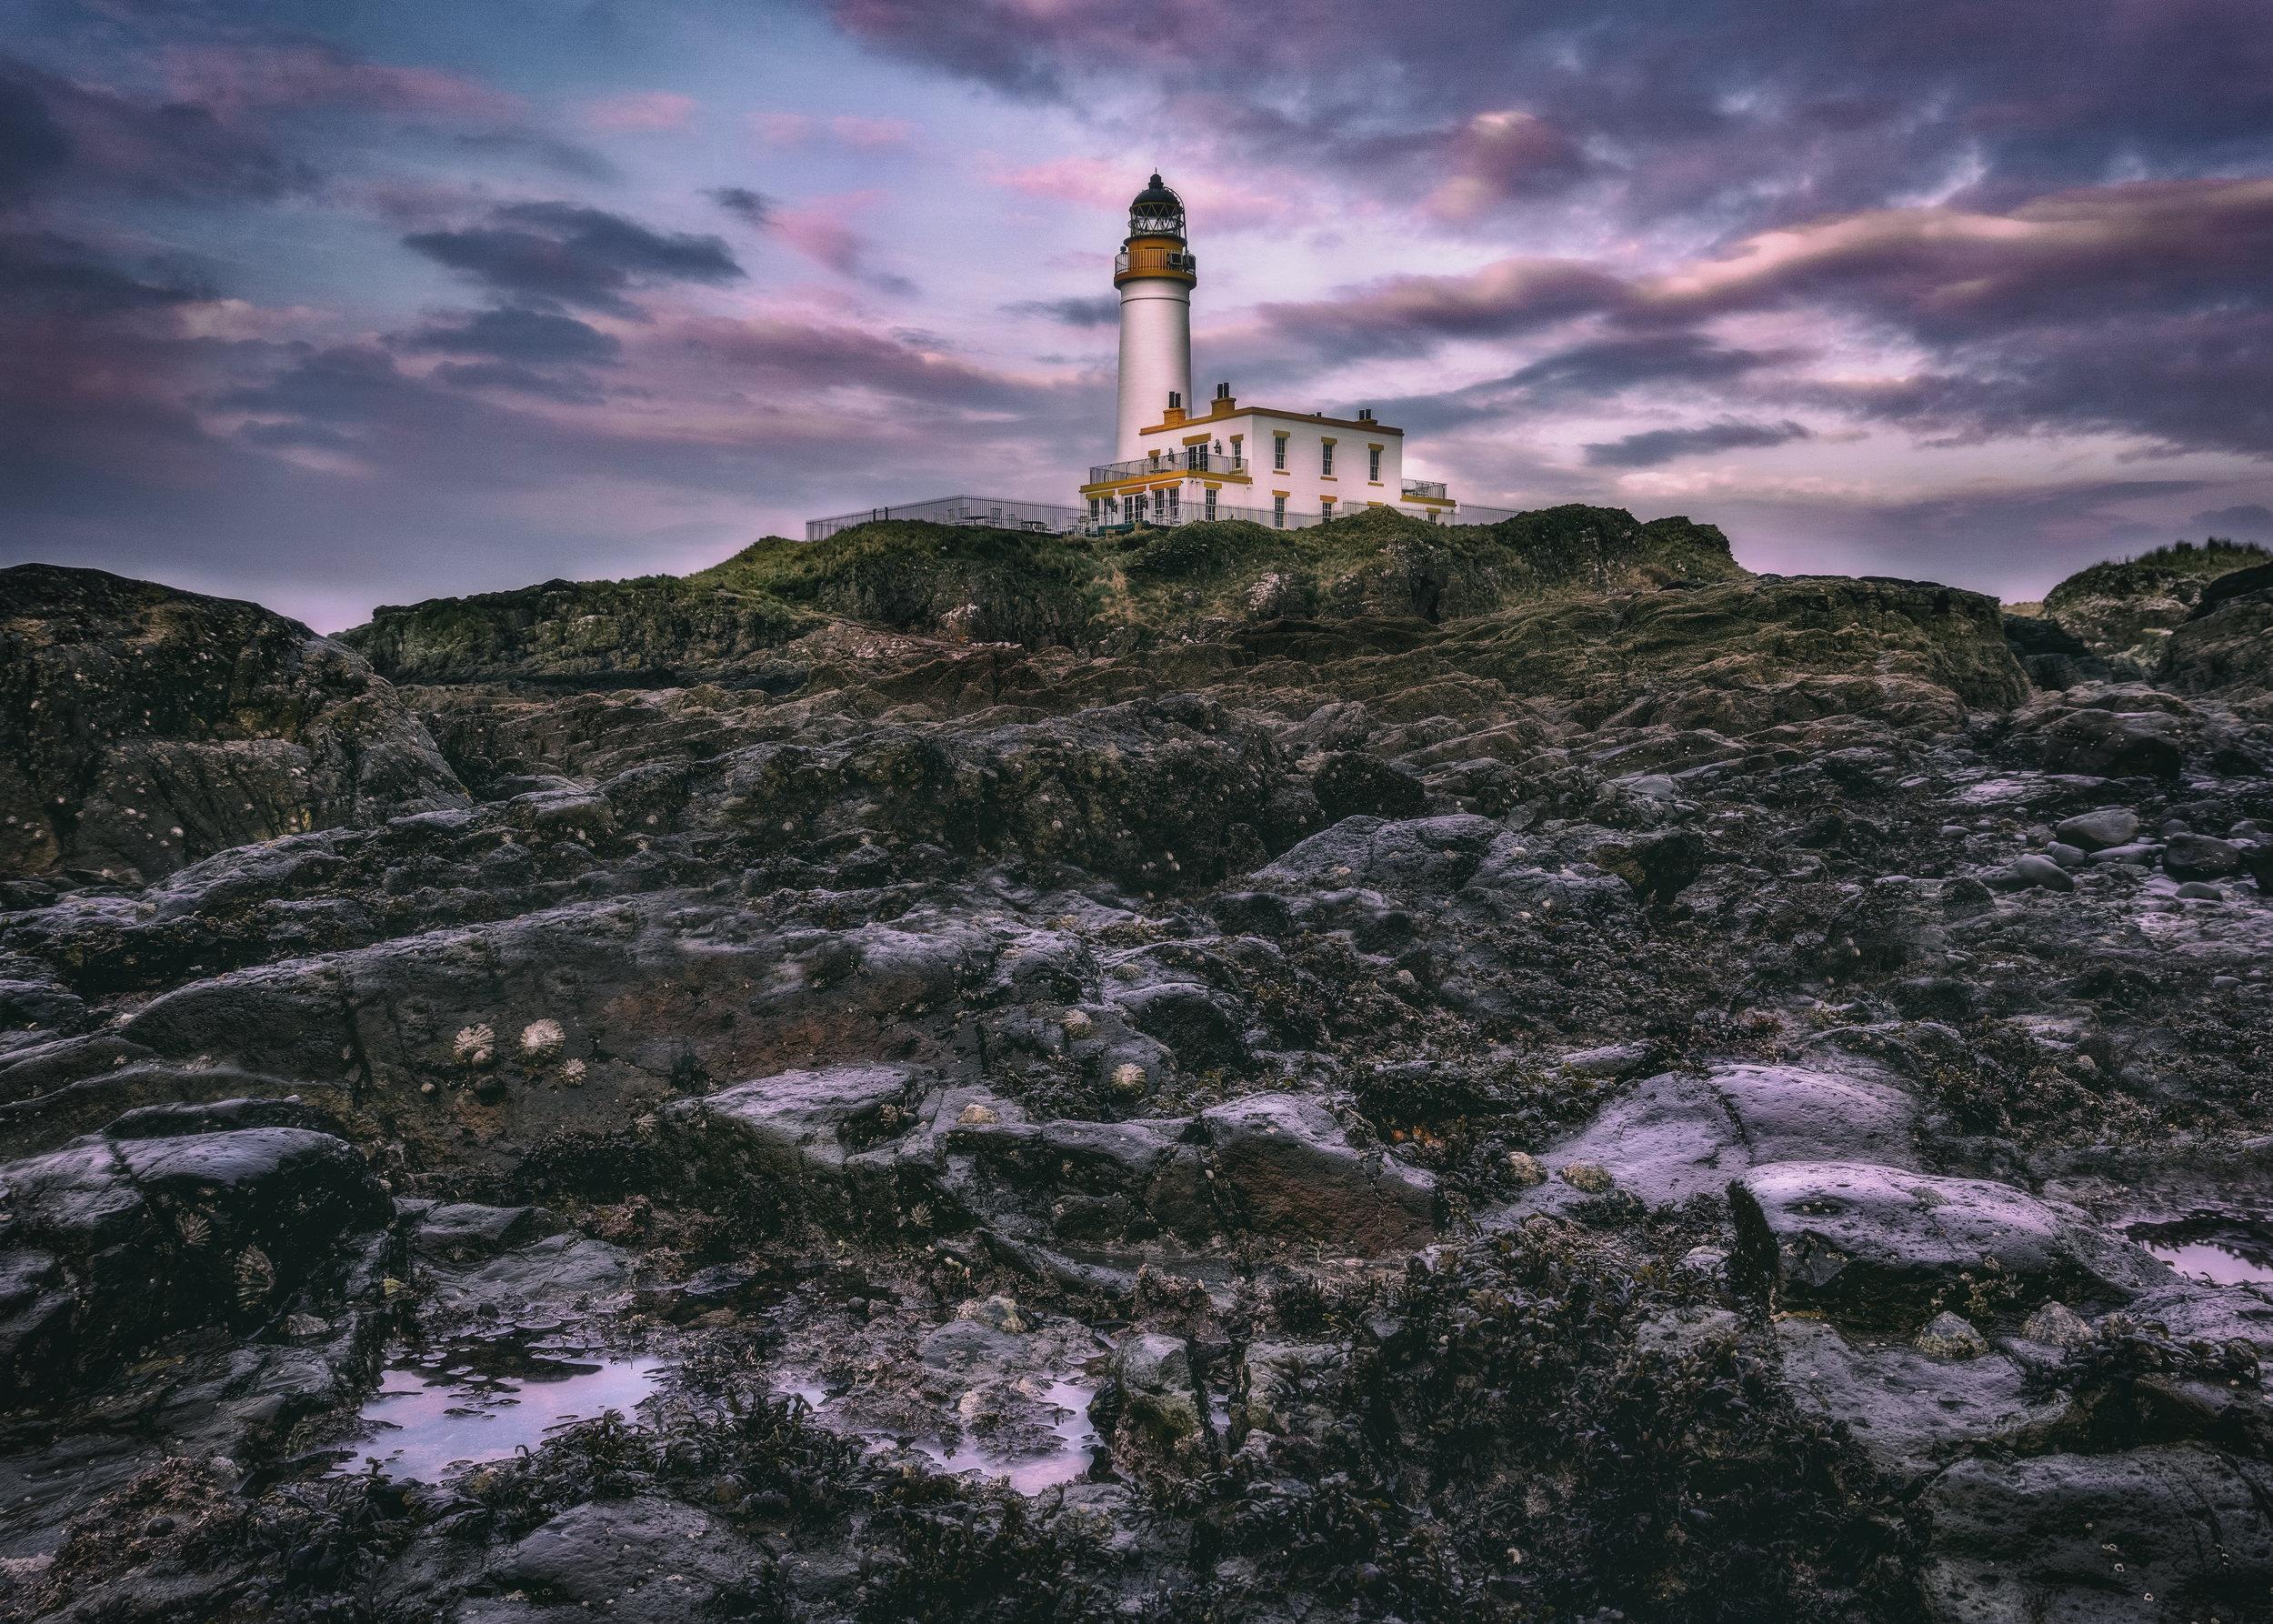 'Dusk at Turnberry Lighthouse'